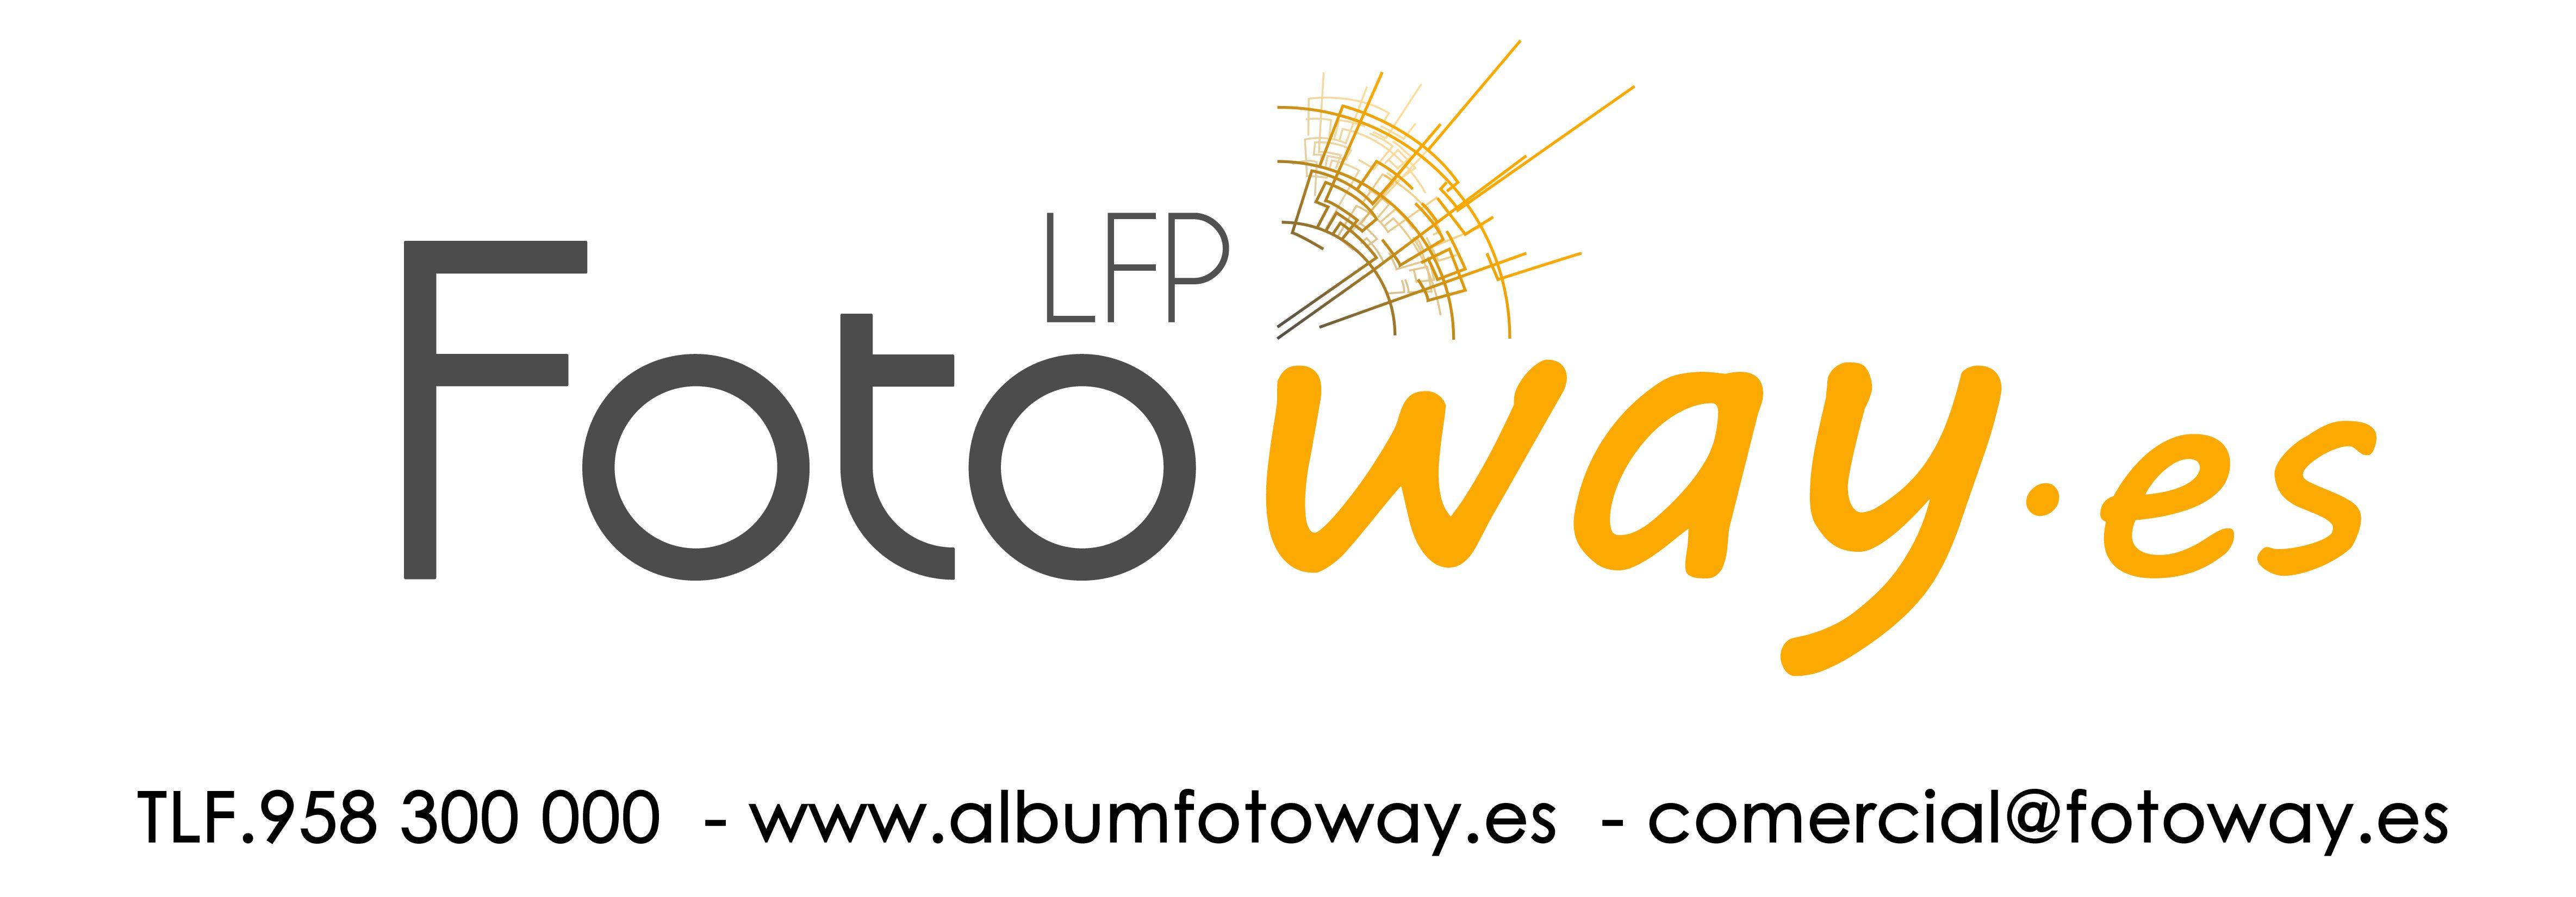 fotoway-01